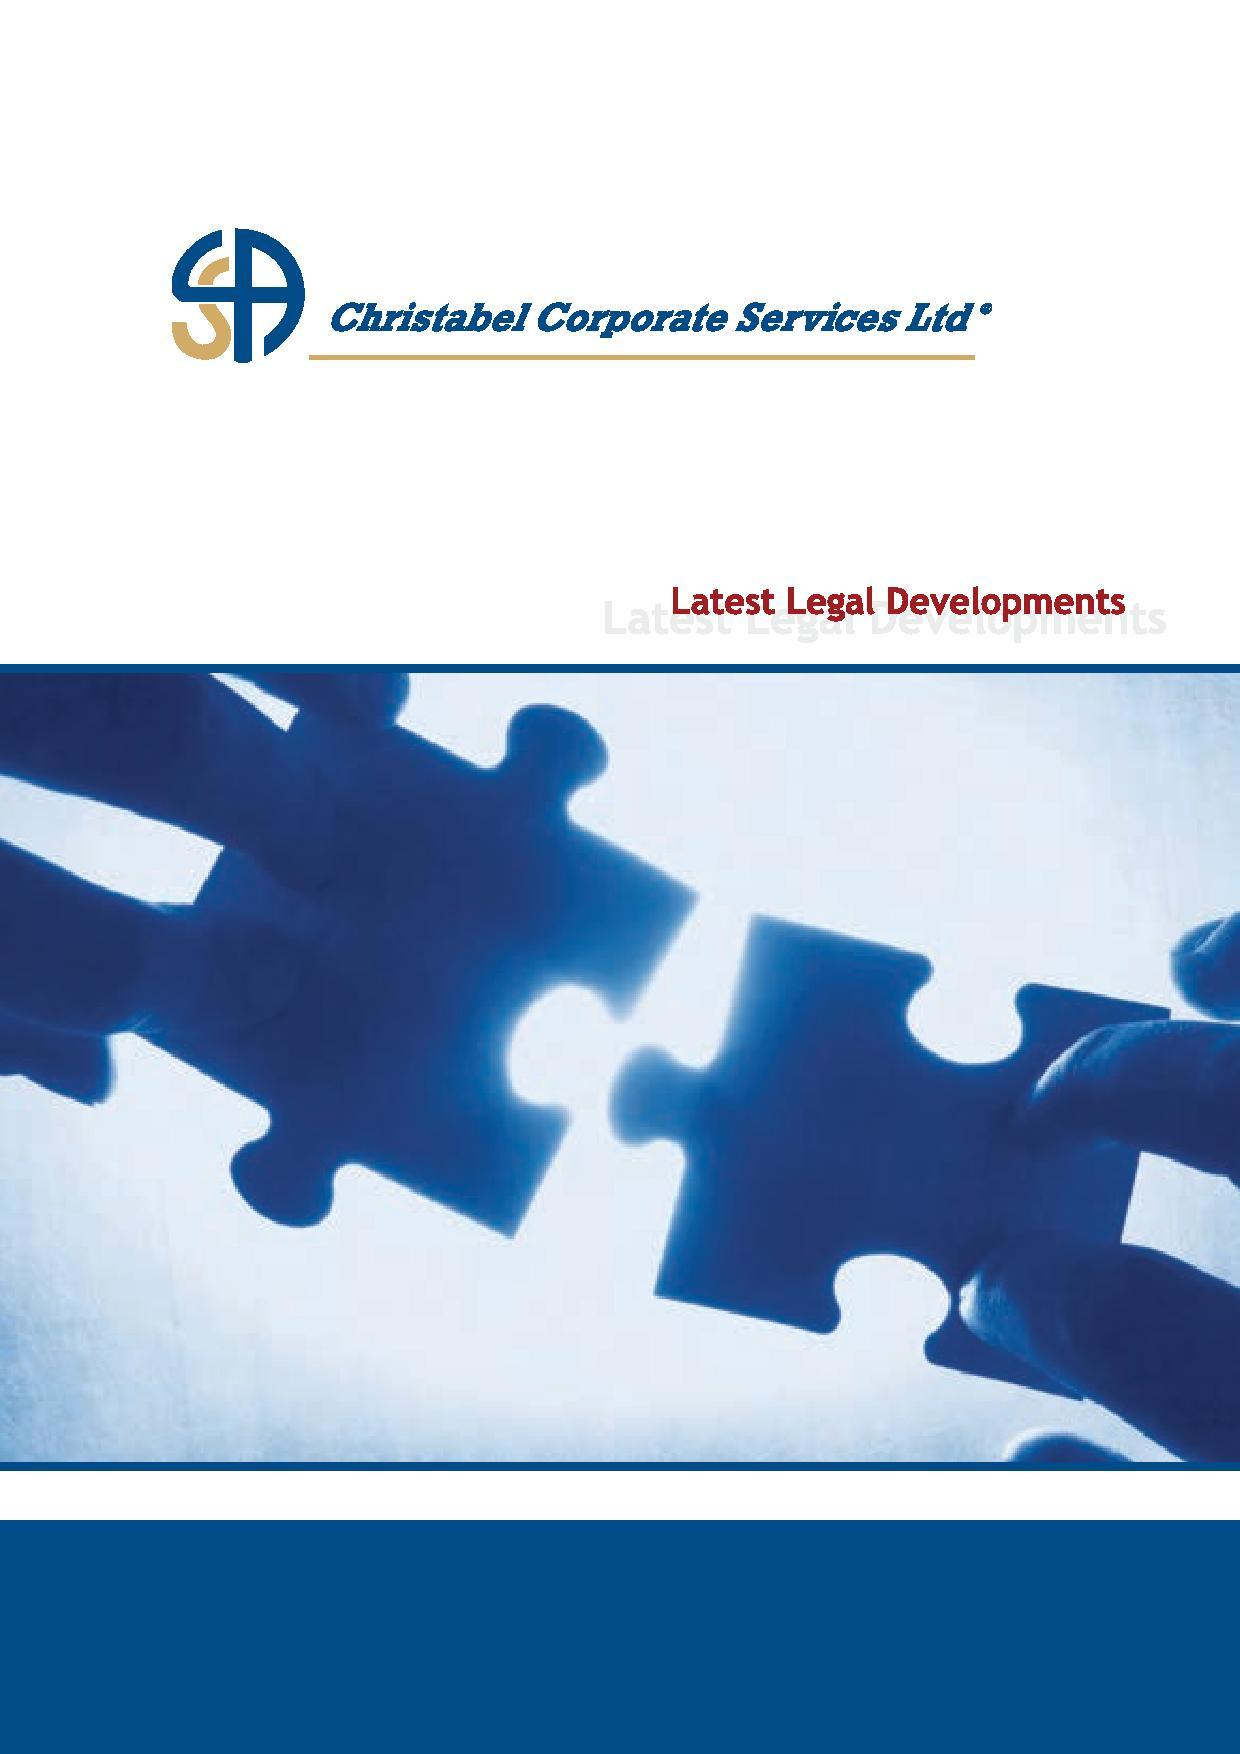 Legal Development